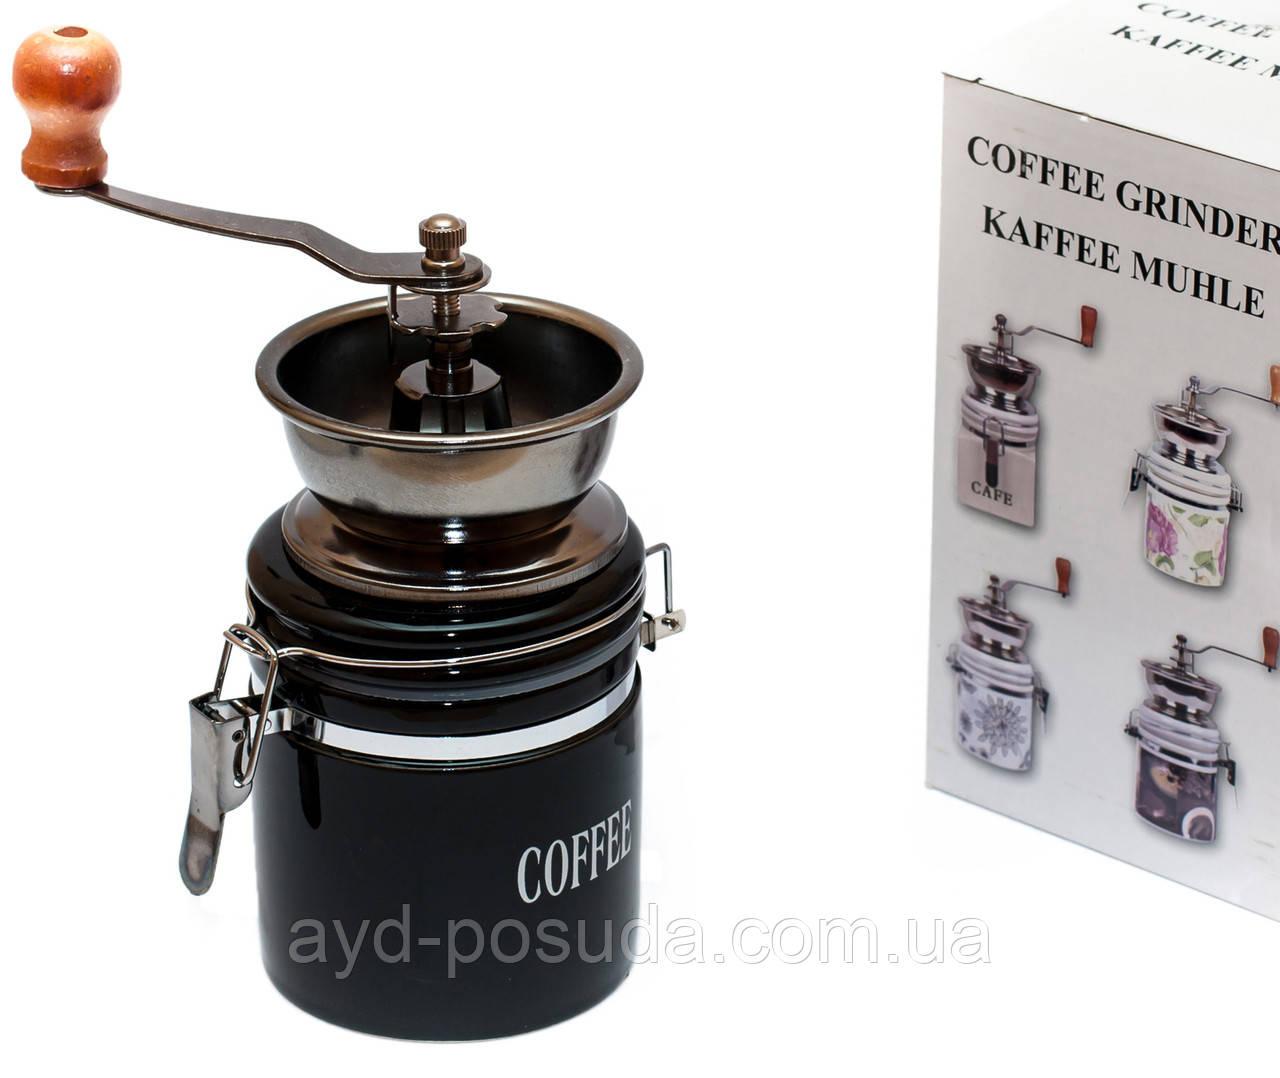 Ручна кавомолка W 202